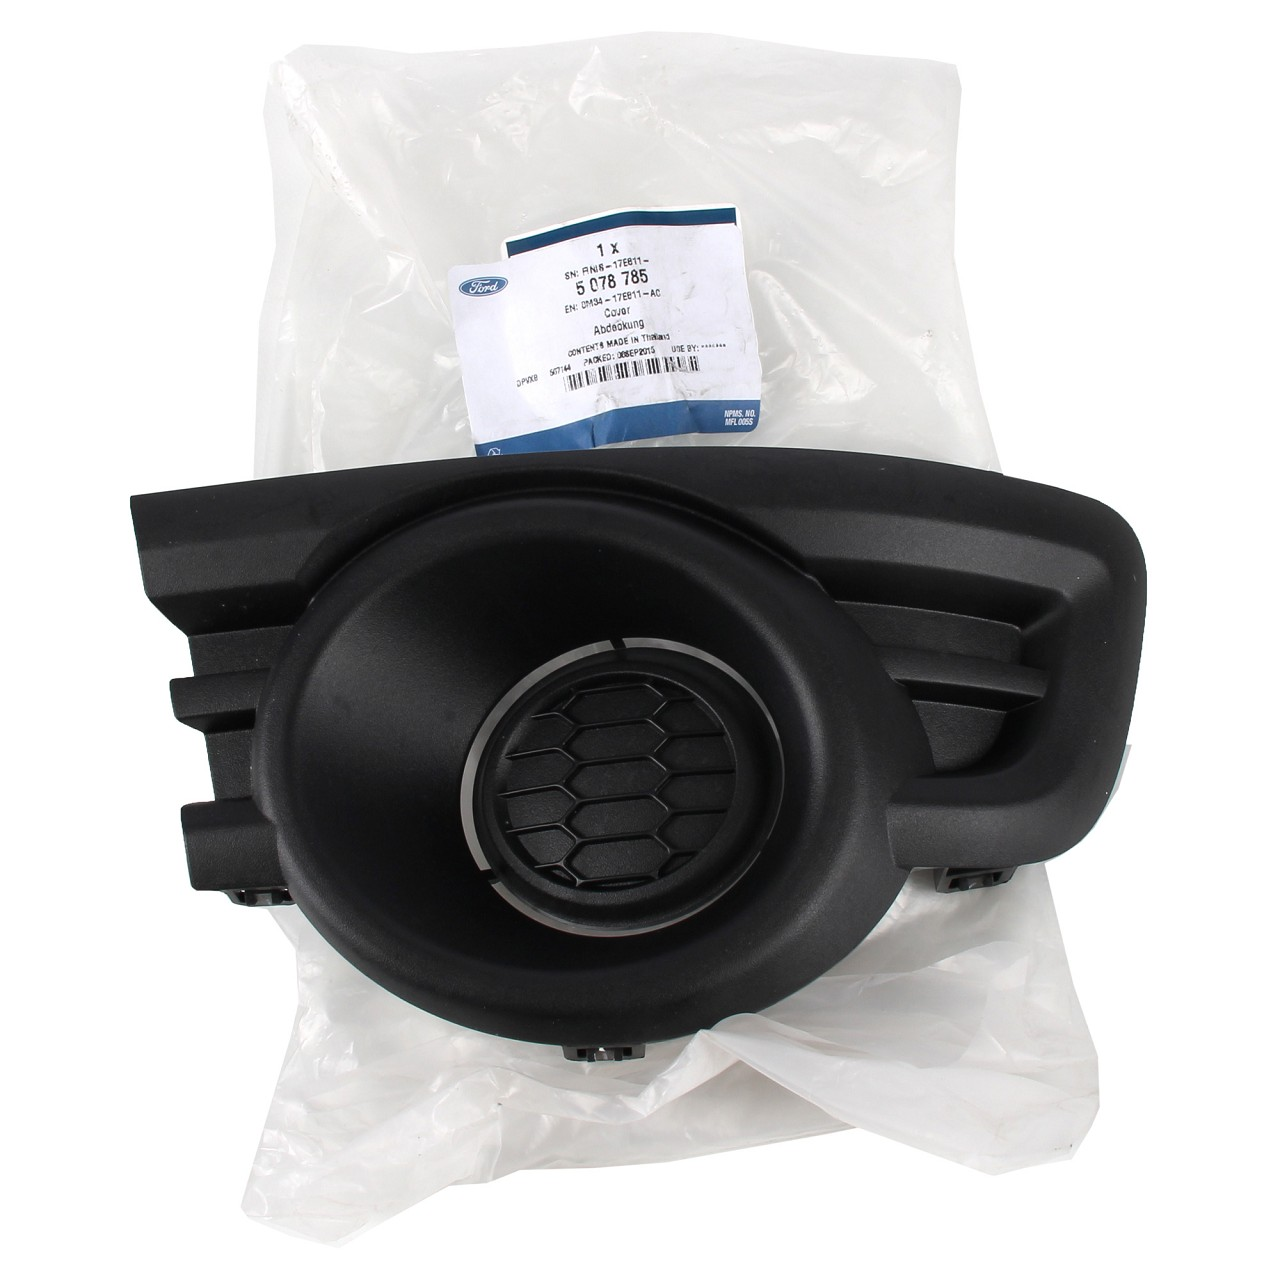 ORIGINAL Ford Blende Abdeckung Nebelscheinwerfer RANGER ET vorne links 5078785